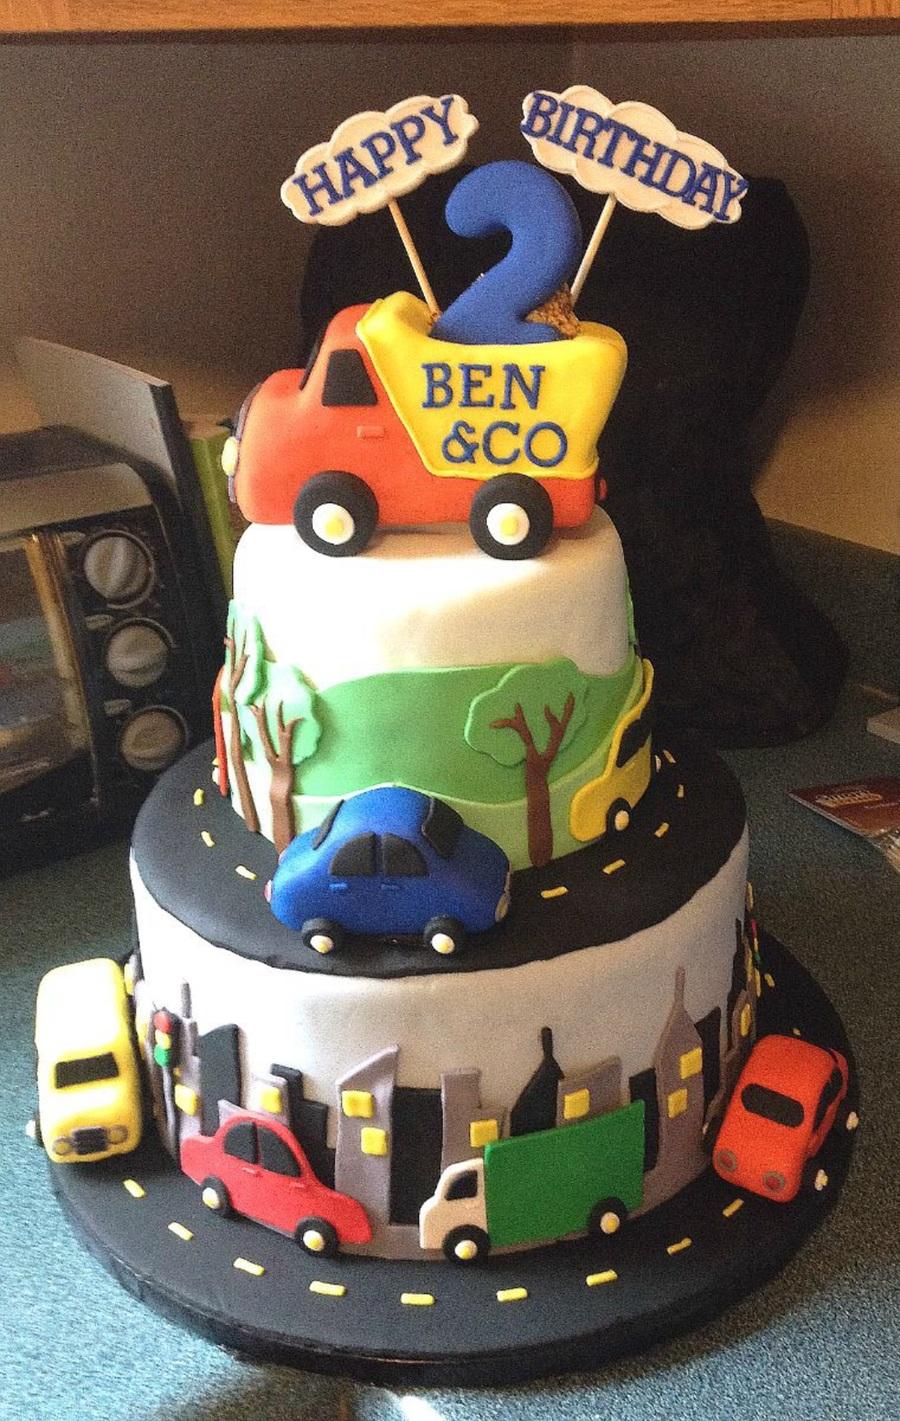 Happy Birthday Luxury Car Cake